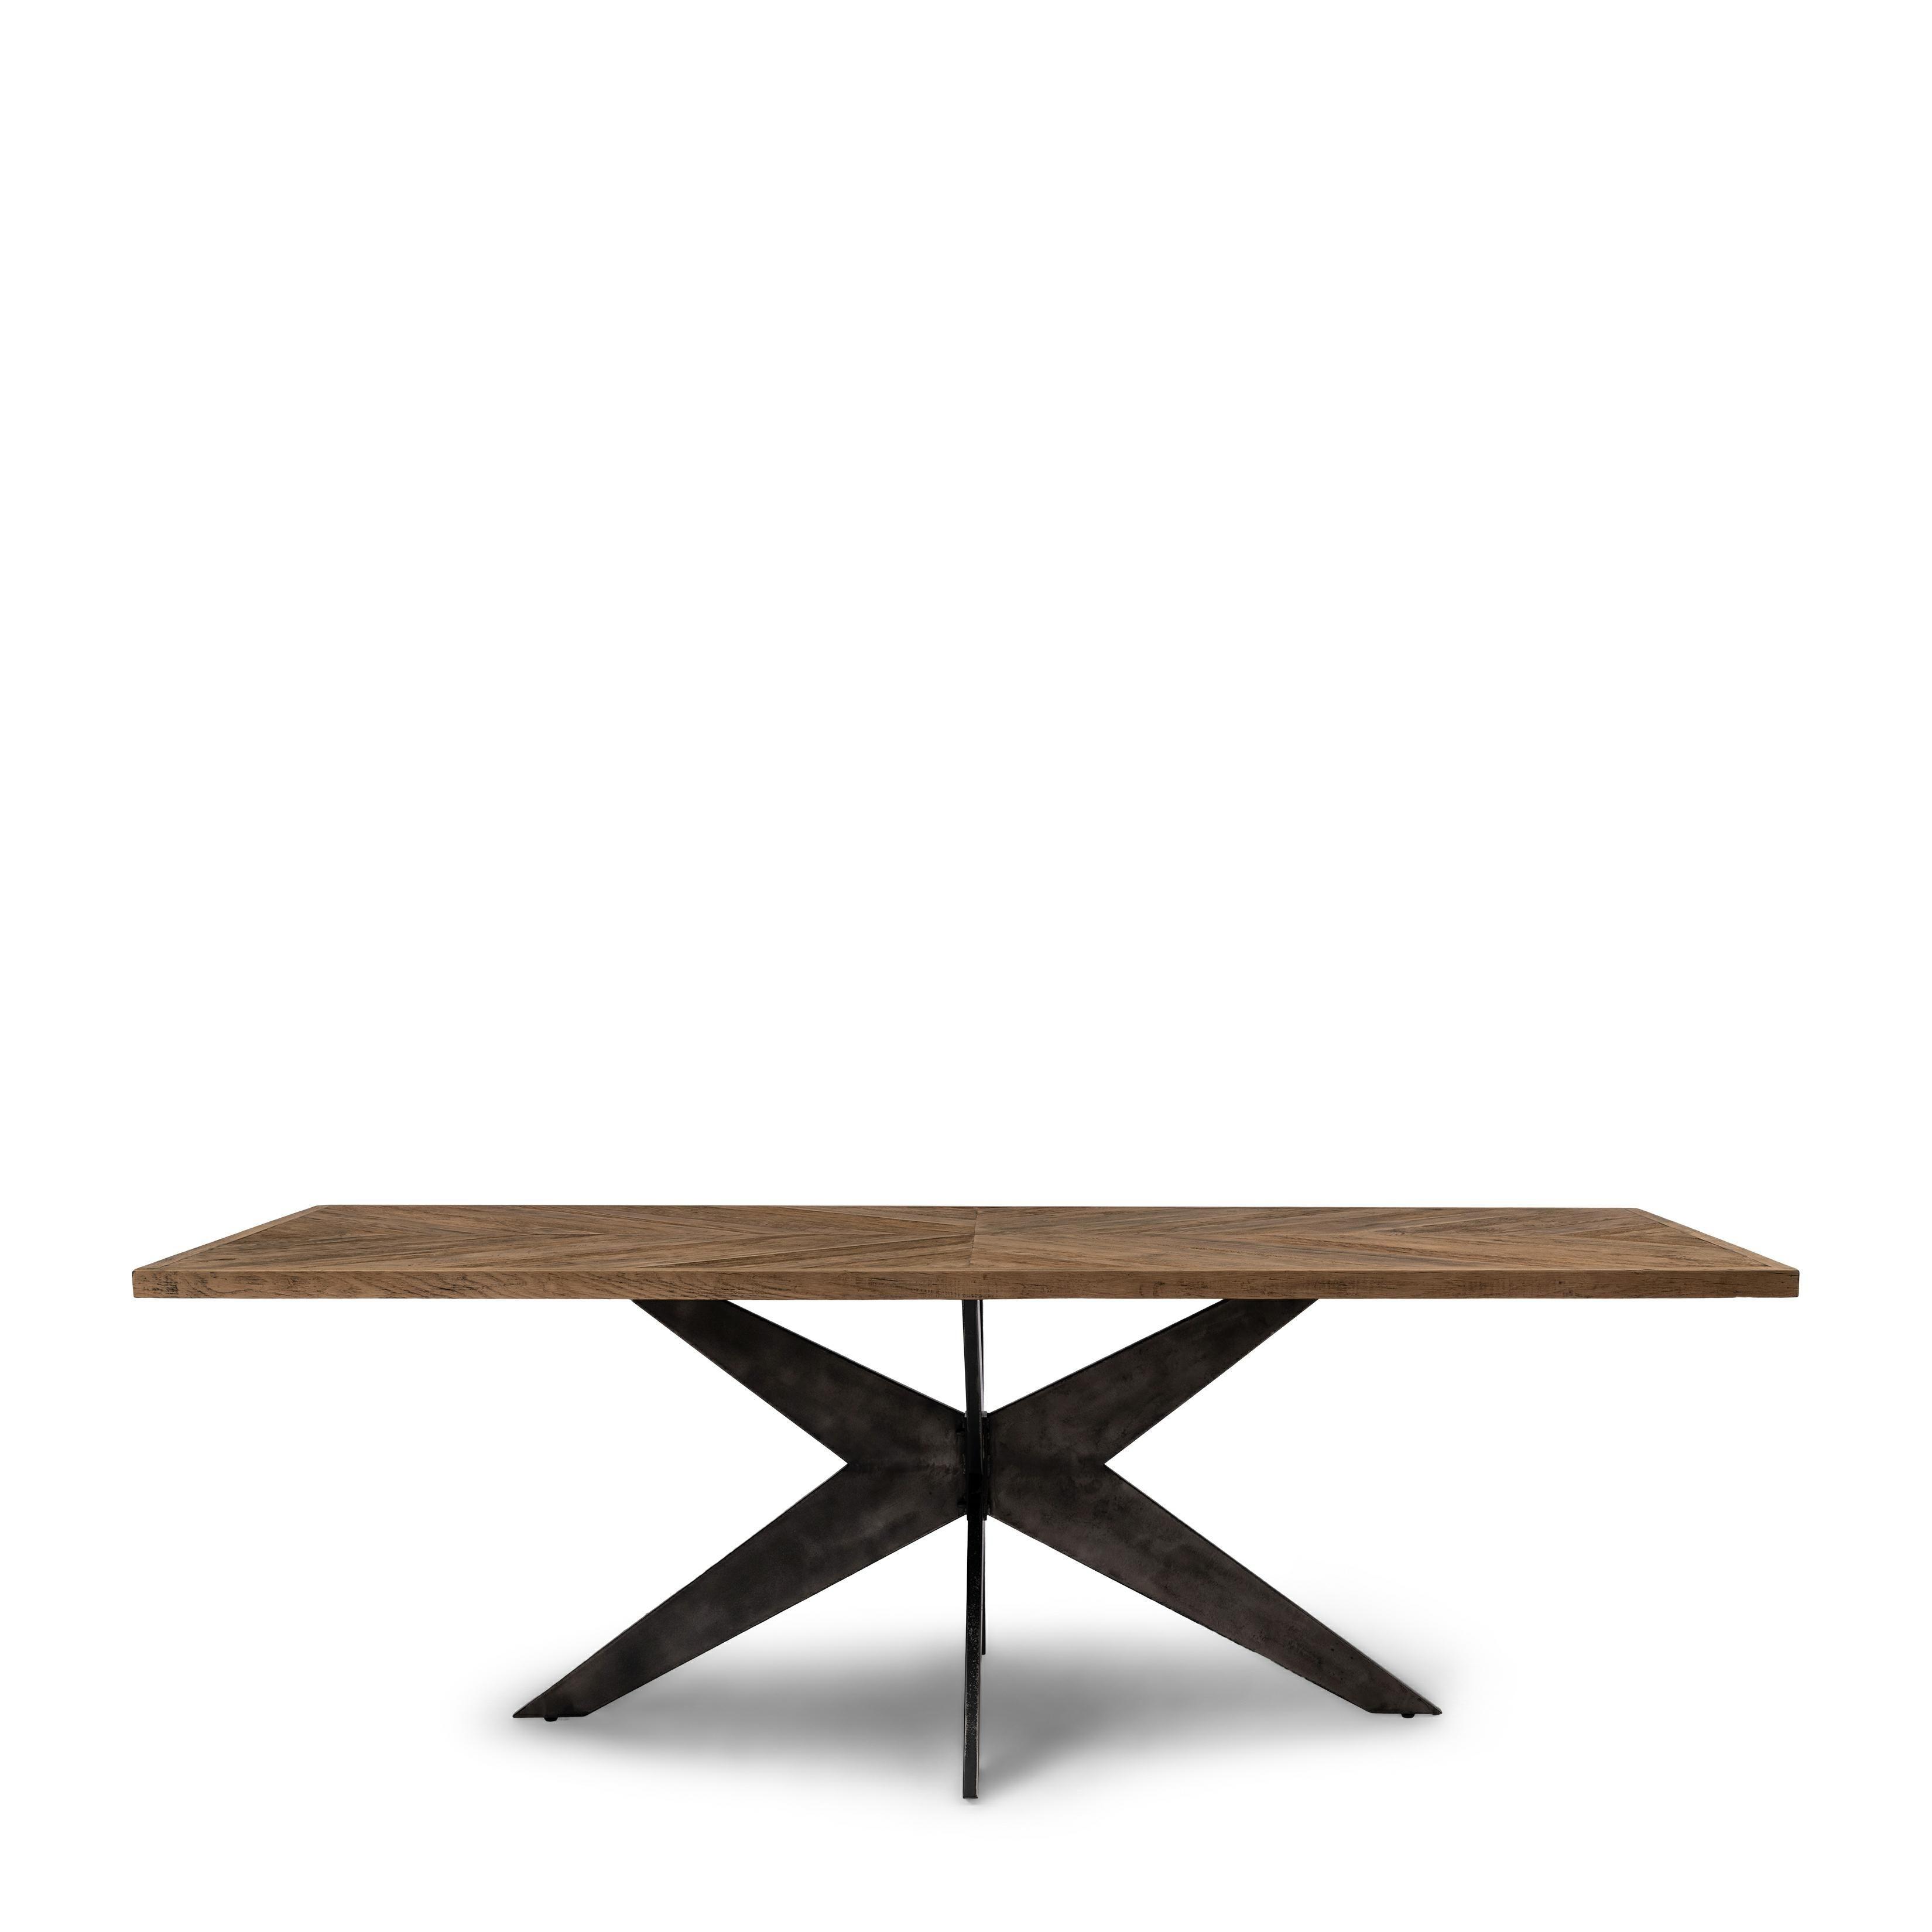 Falcon Crest Dining Table 230X100 / Rivièra Maison